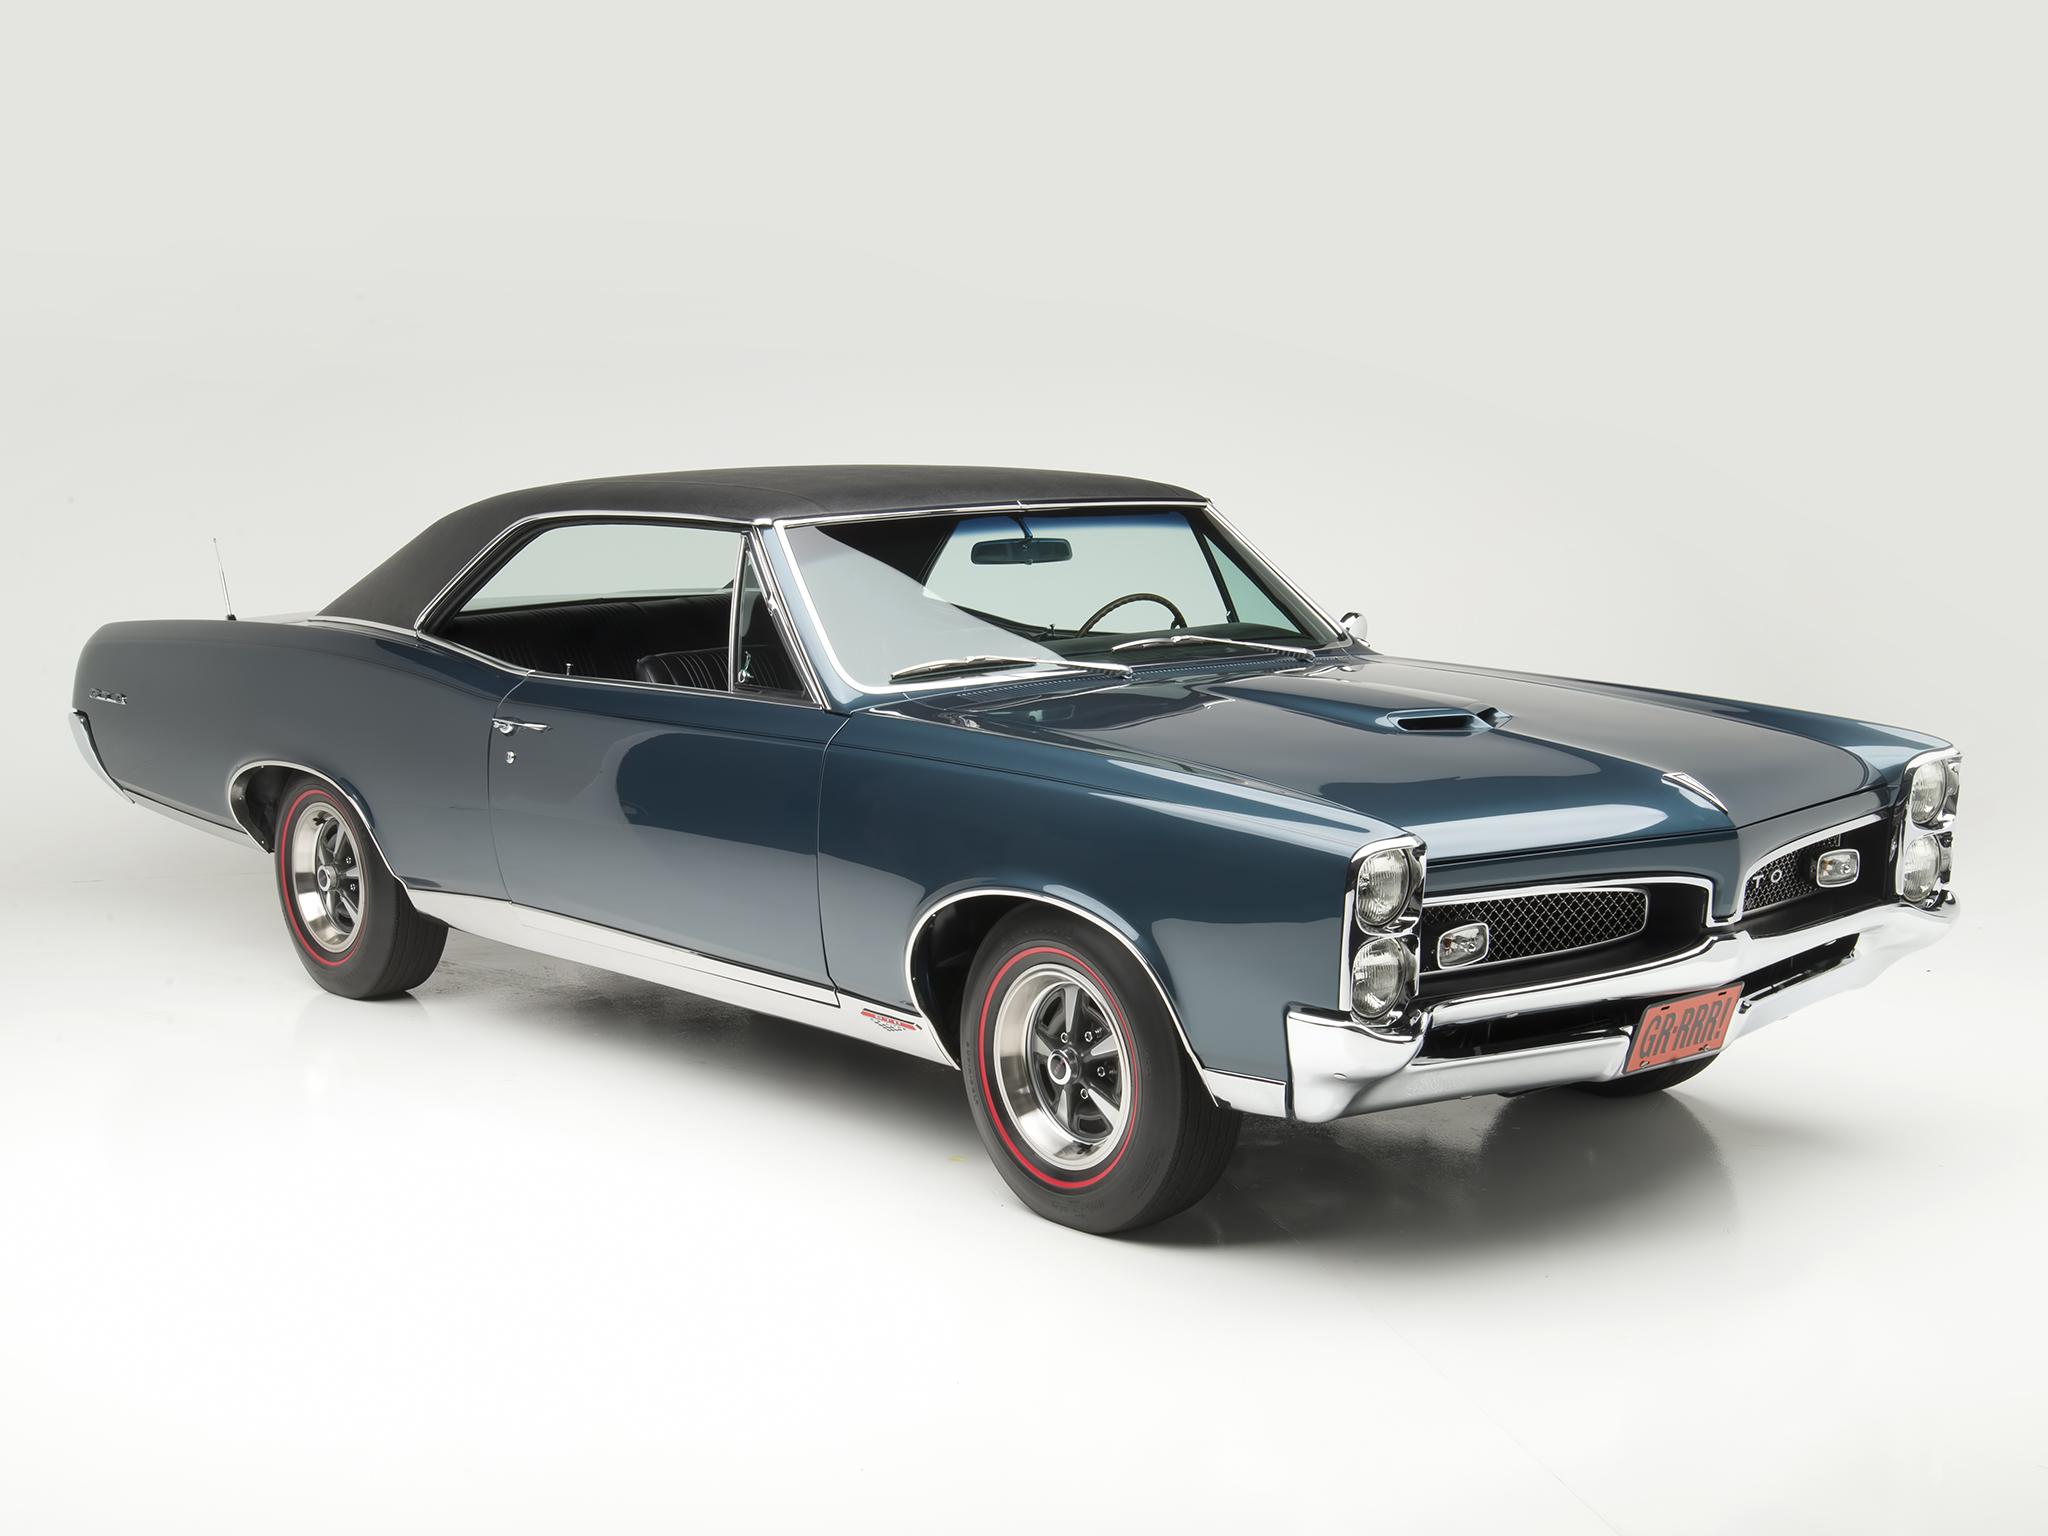 1967 Pontiac Tempest GTO Hardtop Coupe muscle classic e wallpaper 2048x1536